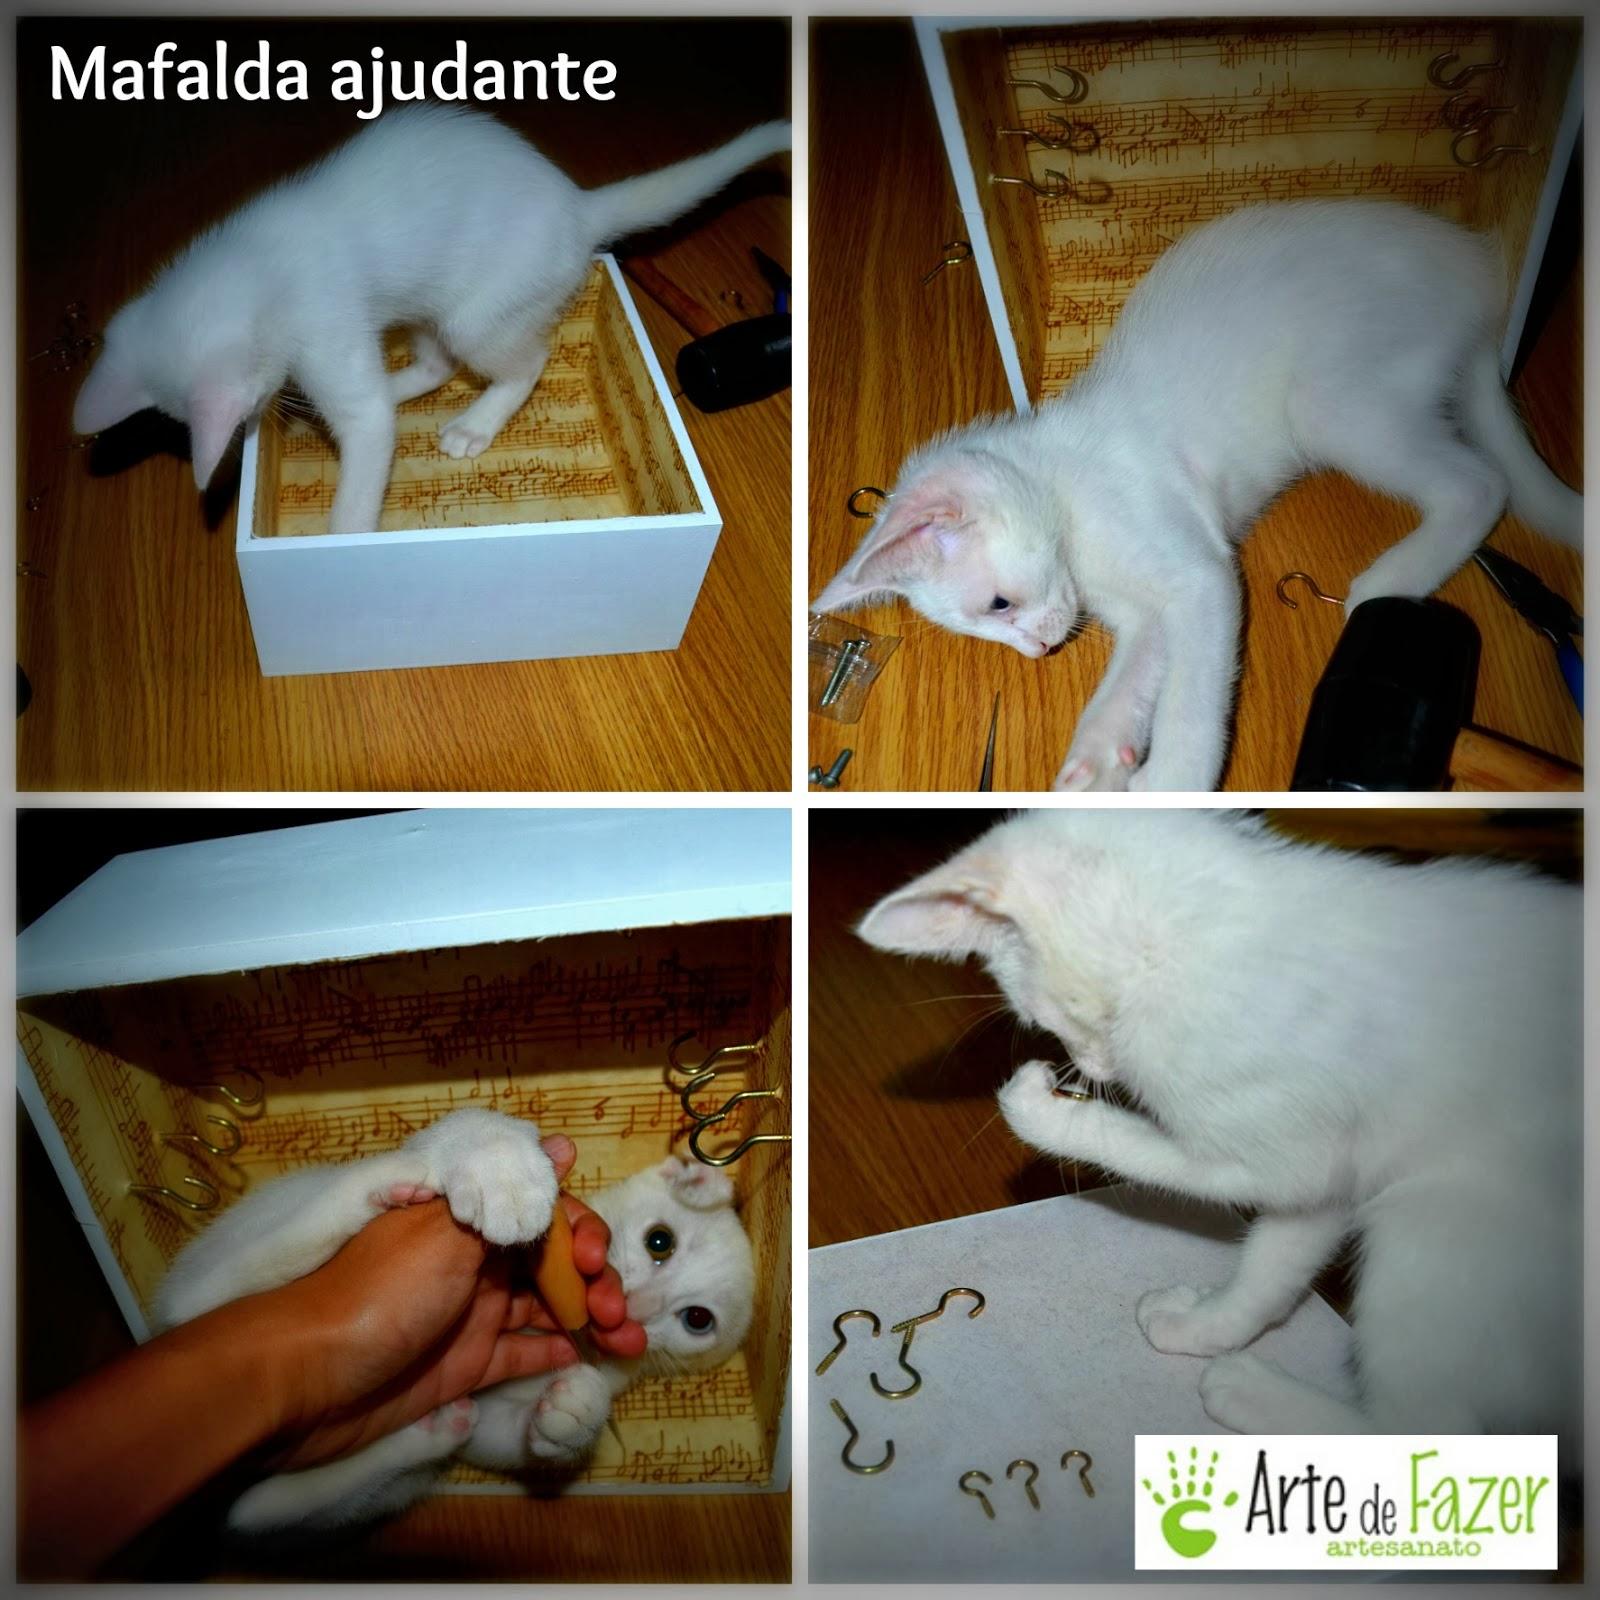 Mafalda ajudando o tempo todo